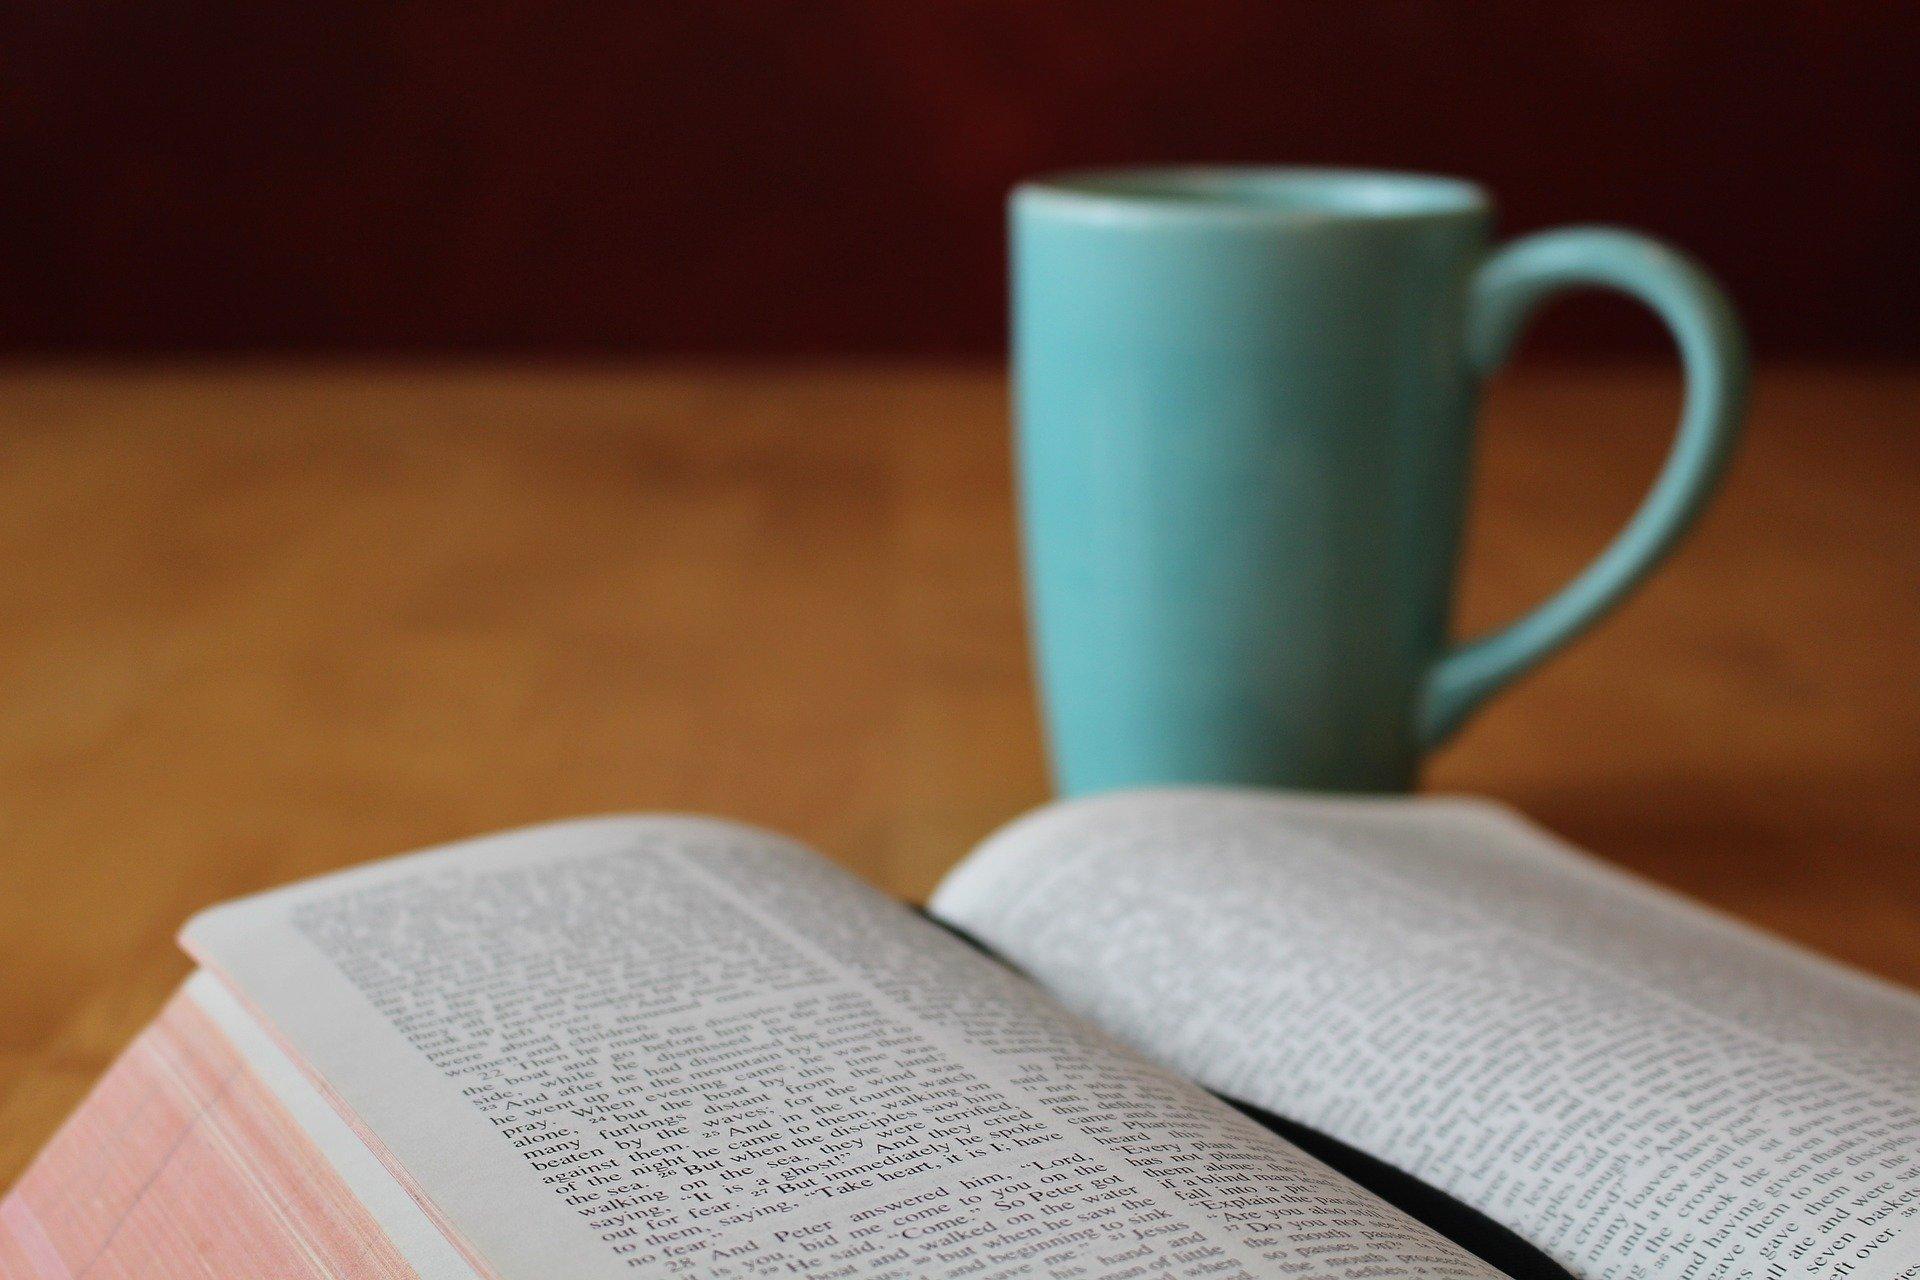 Three Aspects about Biblical Wisdom